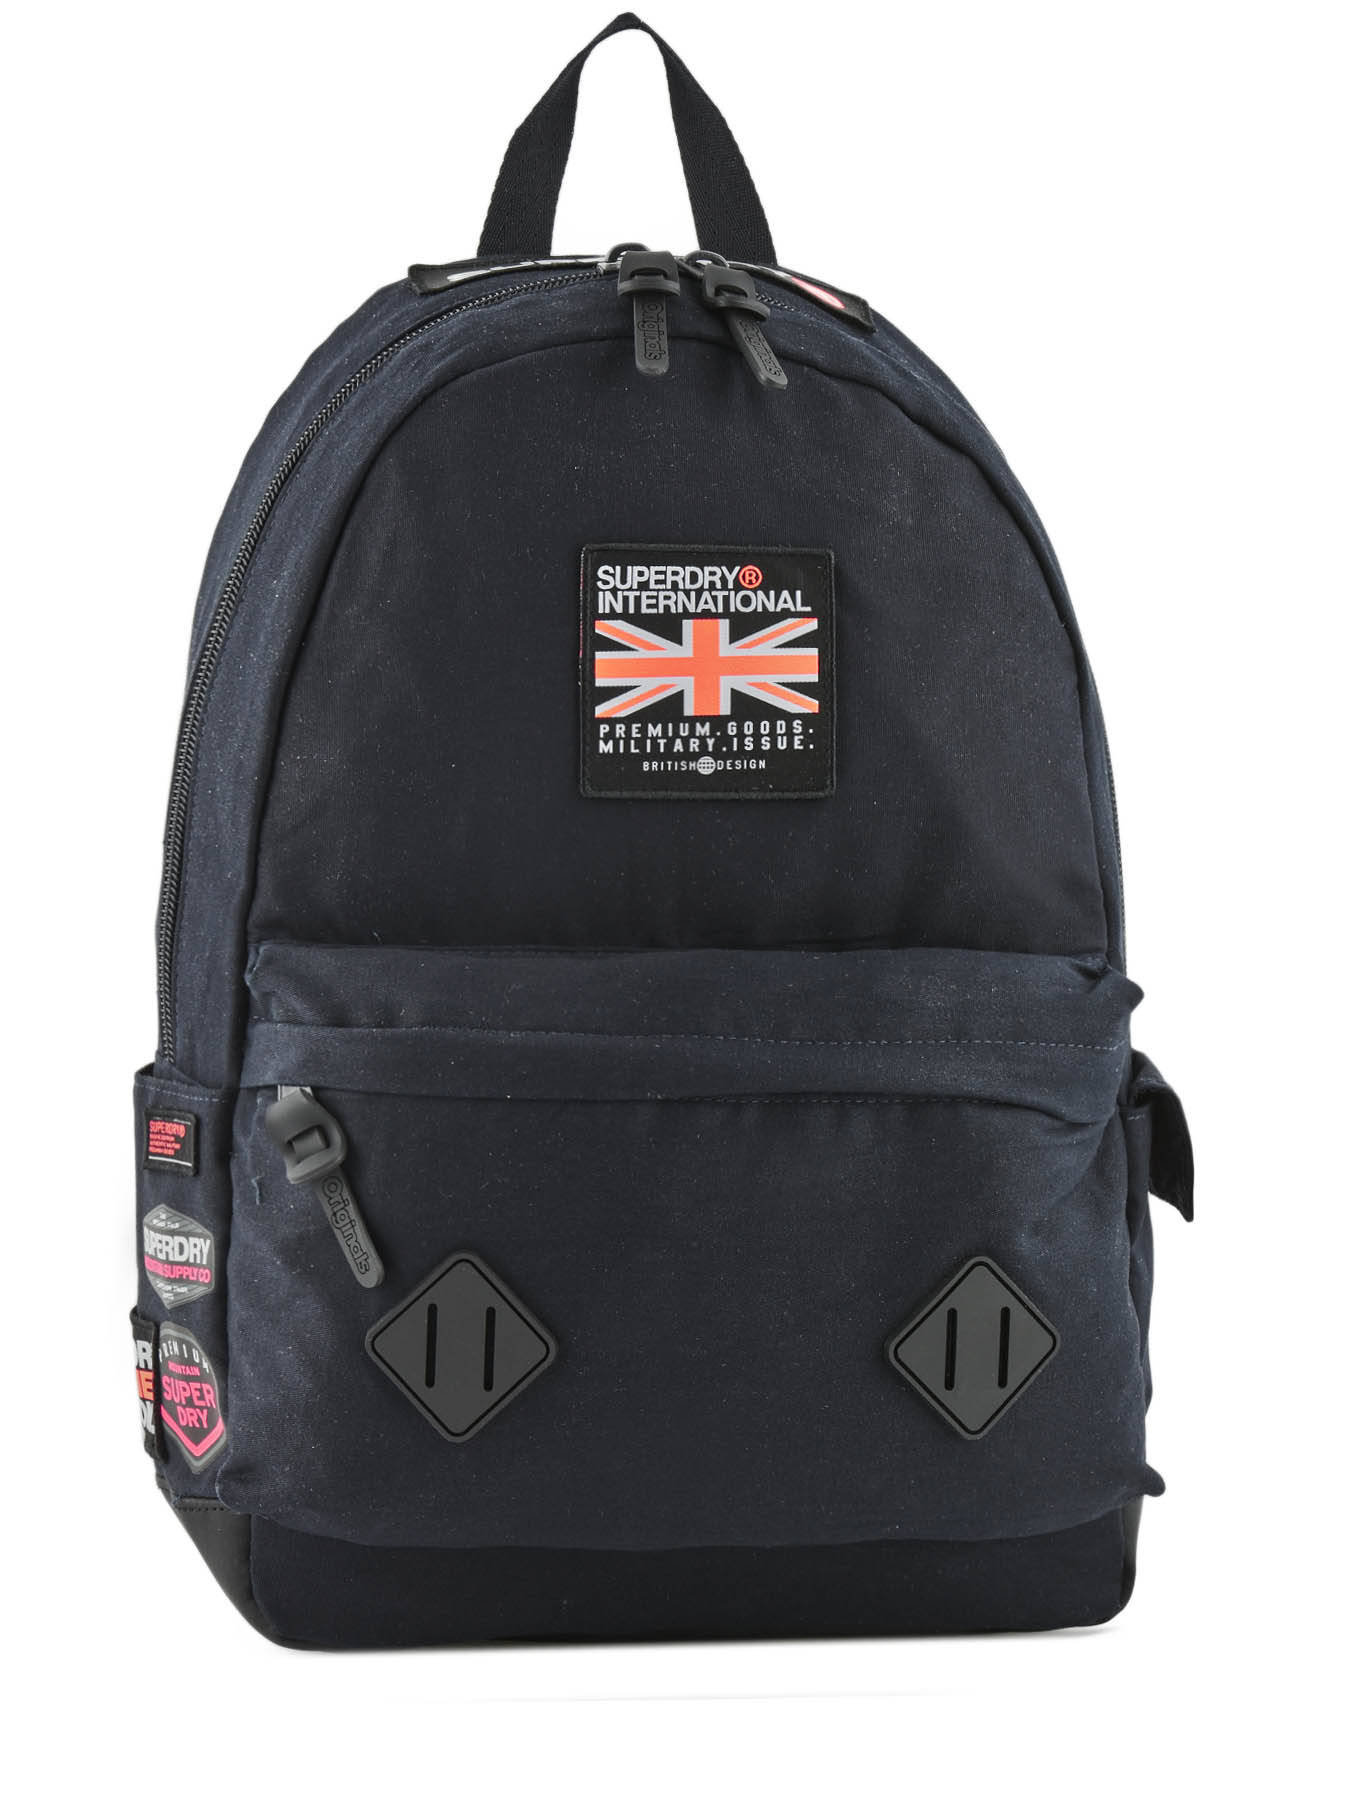 ... Backpack 1 Compartment Superdry Blue backpack men M91003JQ ... b3fa6b8f7c0c5